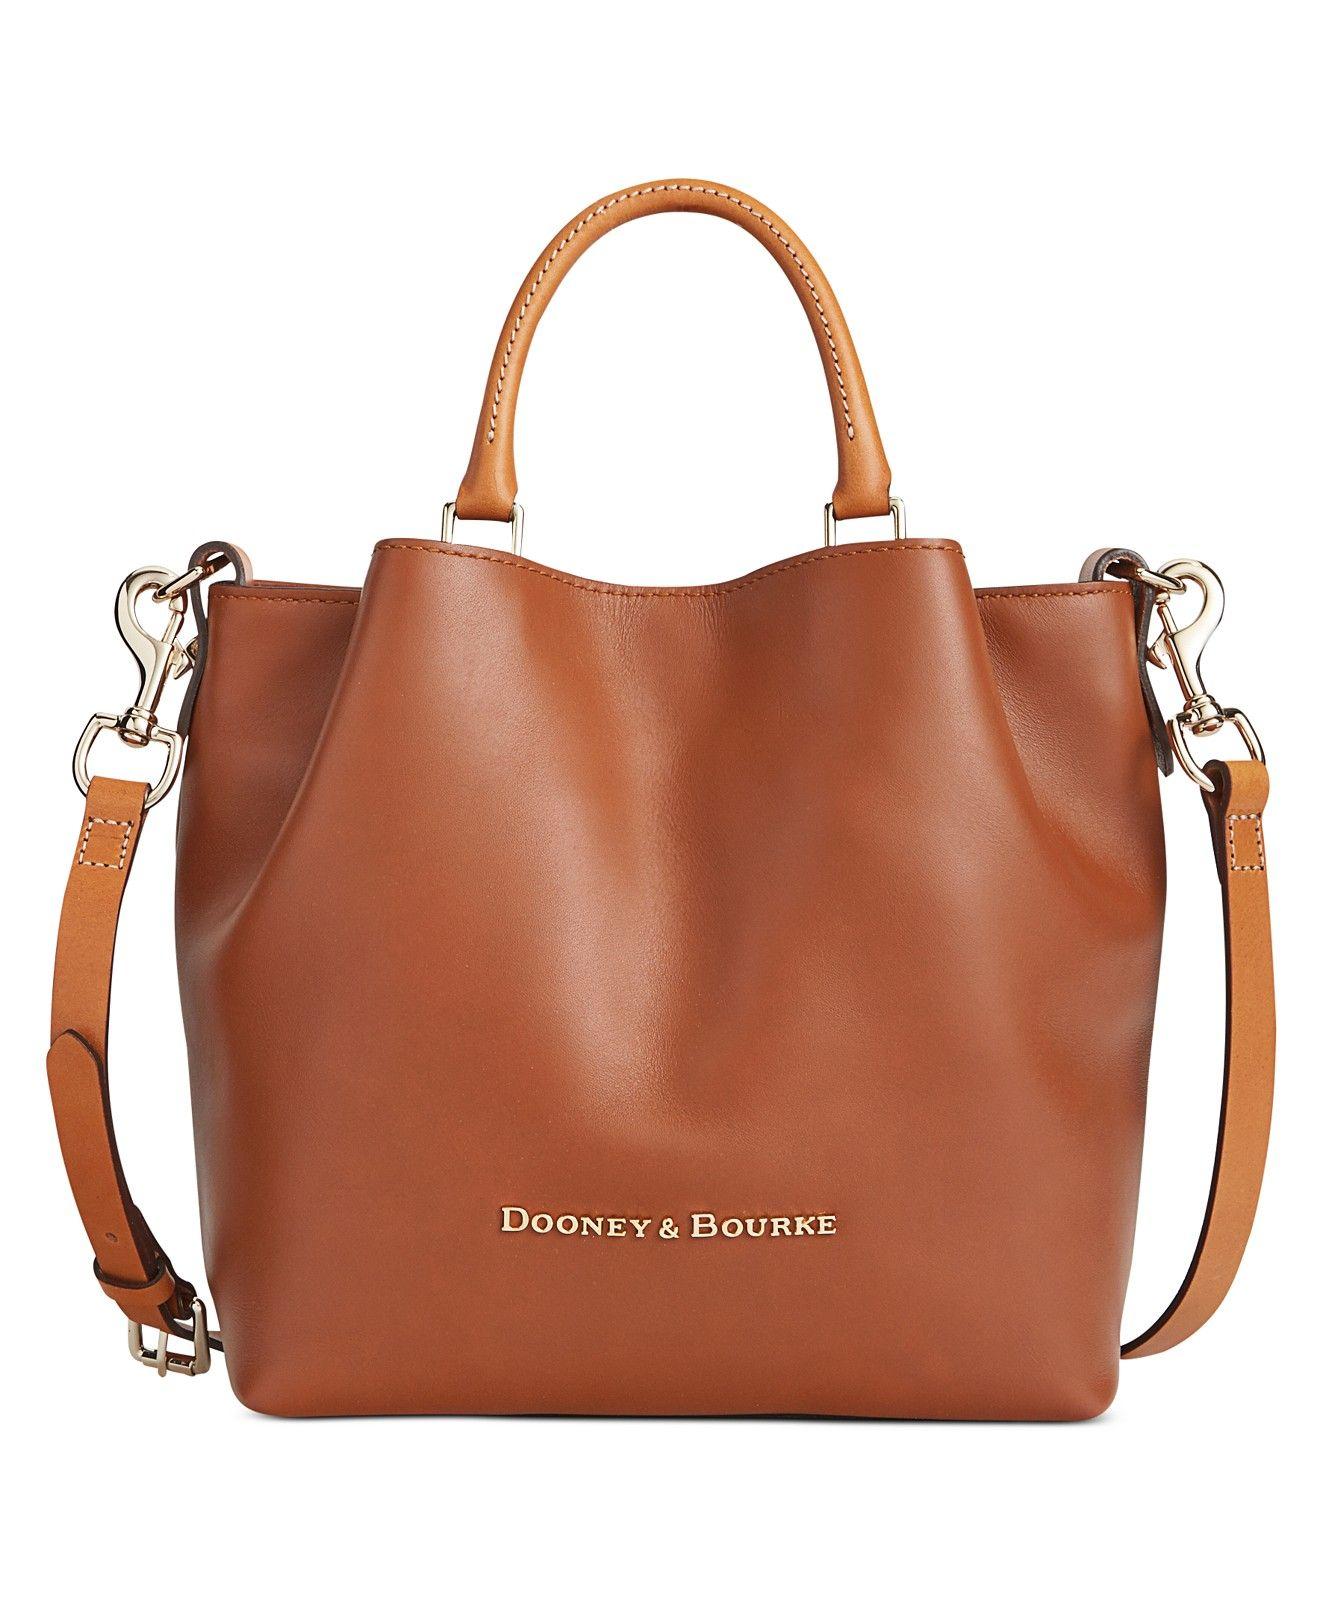 Dooney Bourke Small Barlow Tote Handbags Accessories Macy S